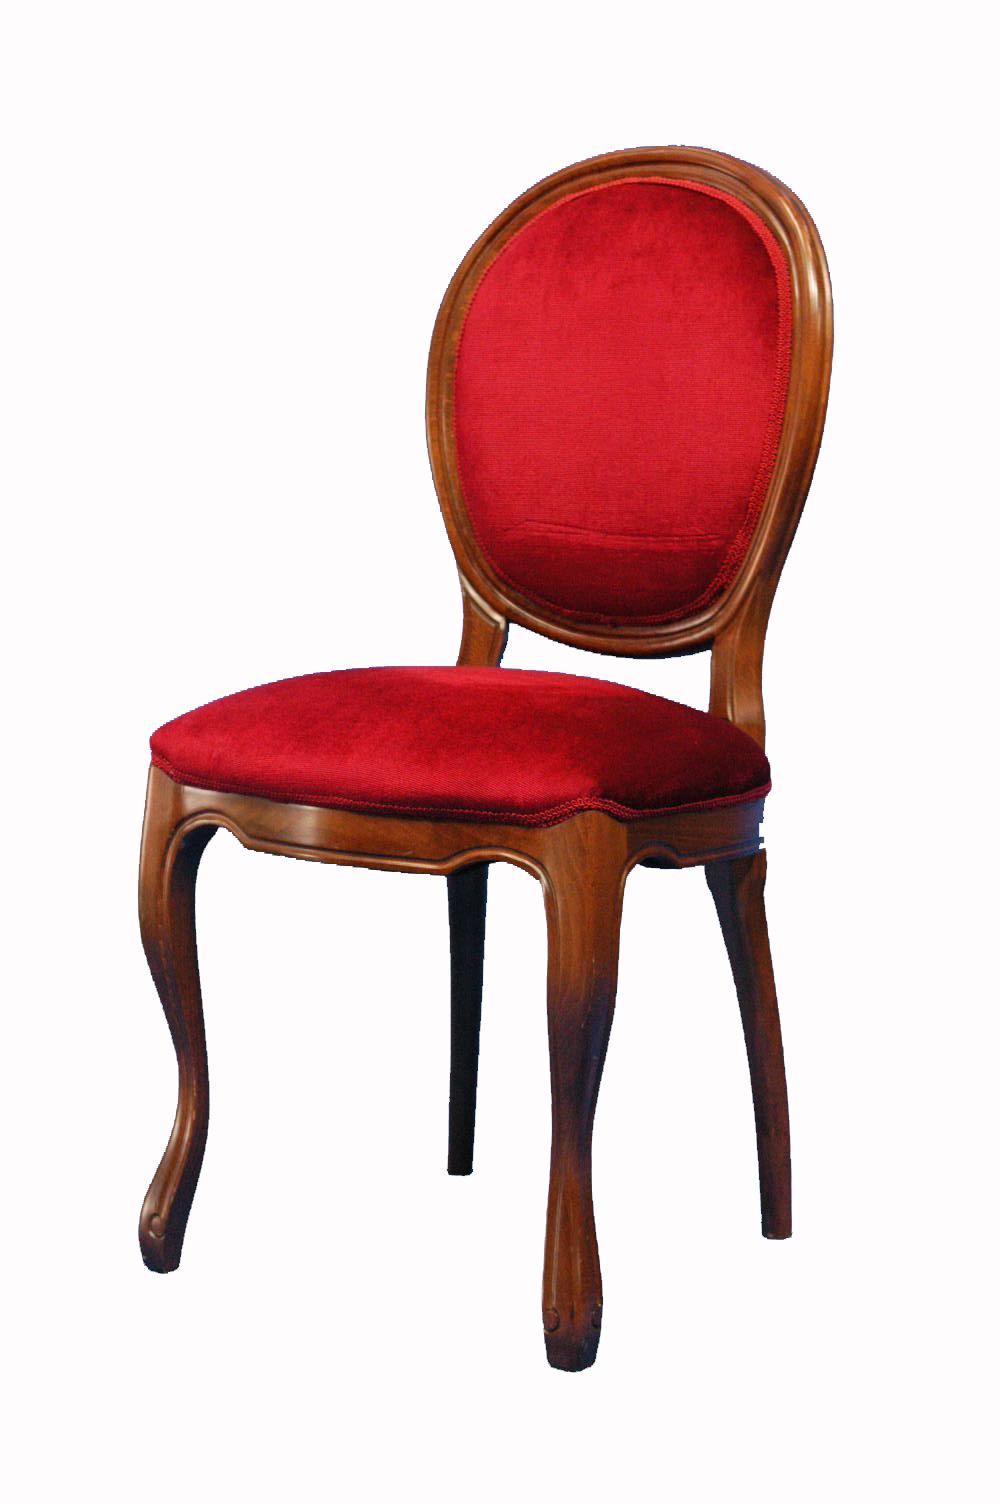 Alquiler de silla cl sica for Pisos de alquiler en silla